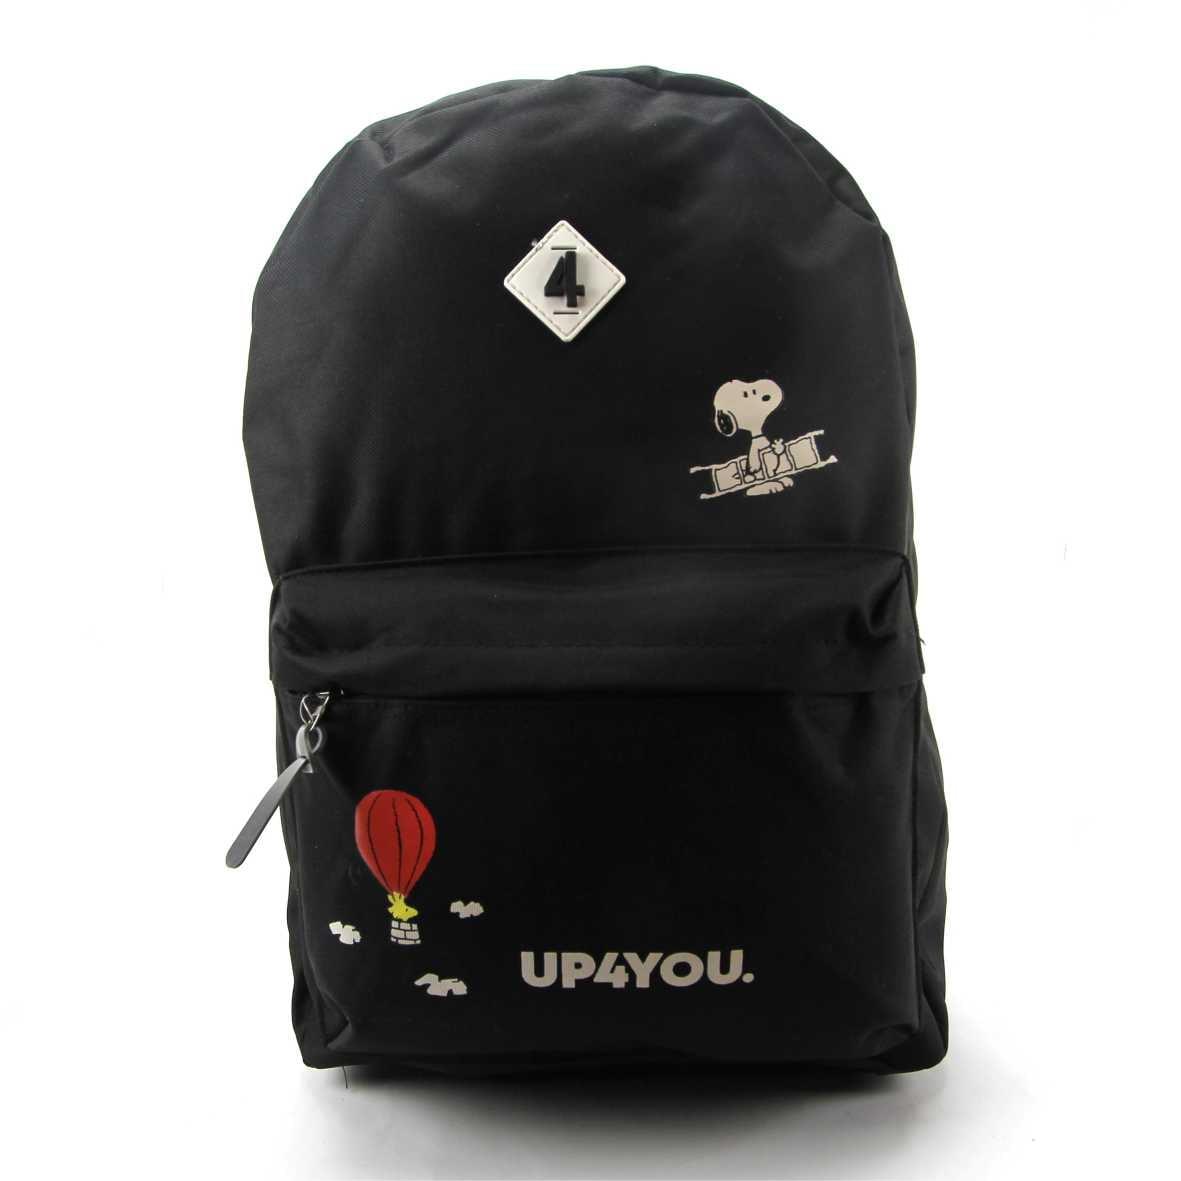 Mochila Up4you x Snoopy Original de Costas Luxcel MS45880UP-PT